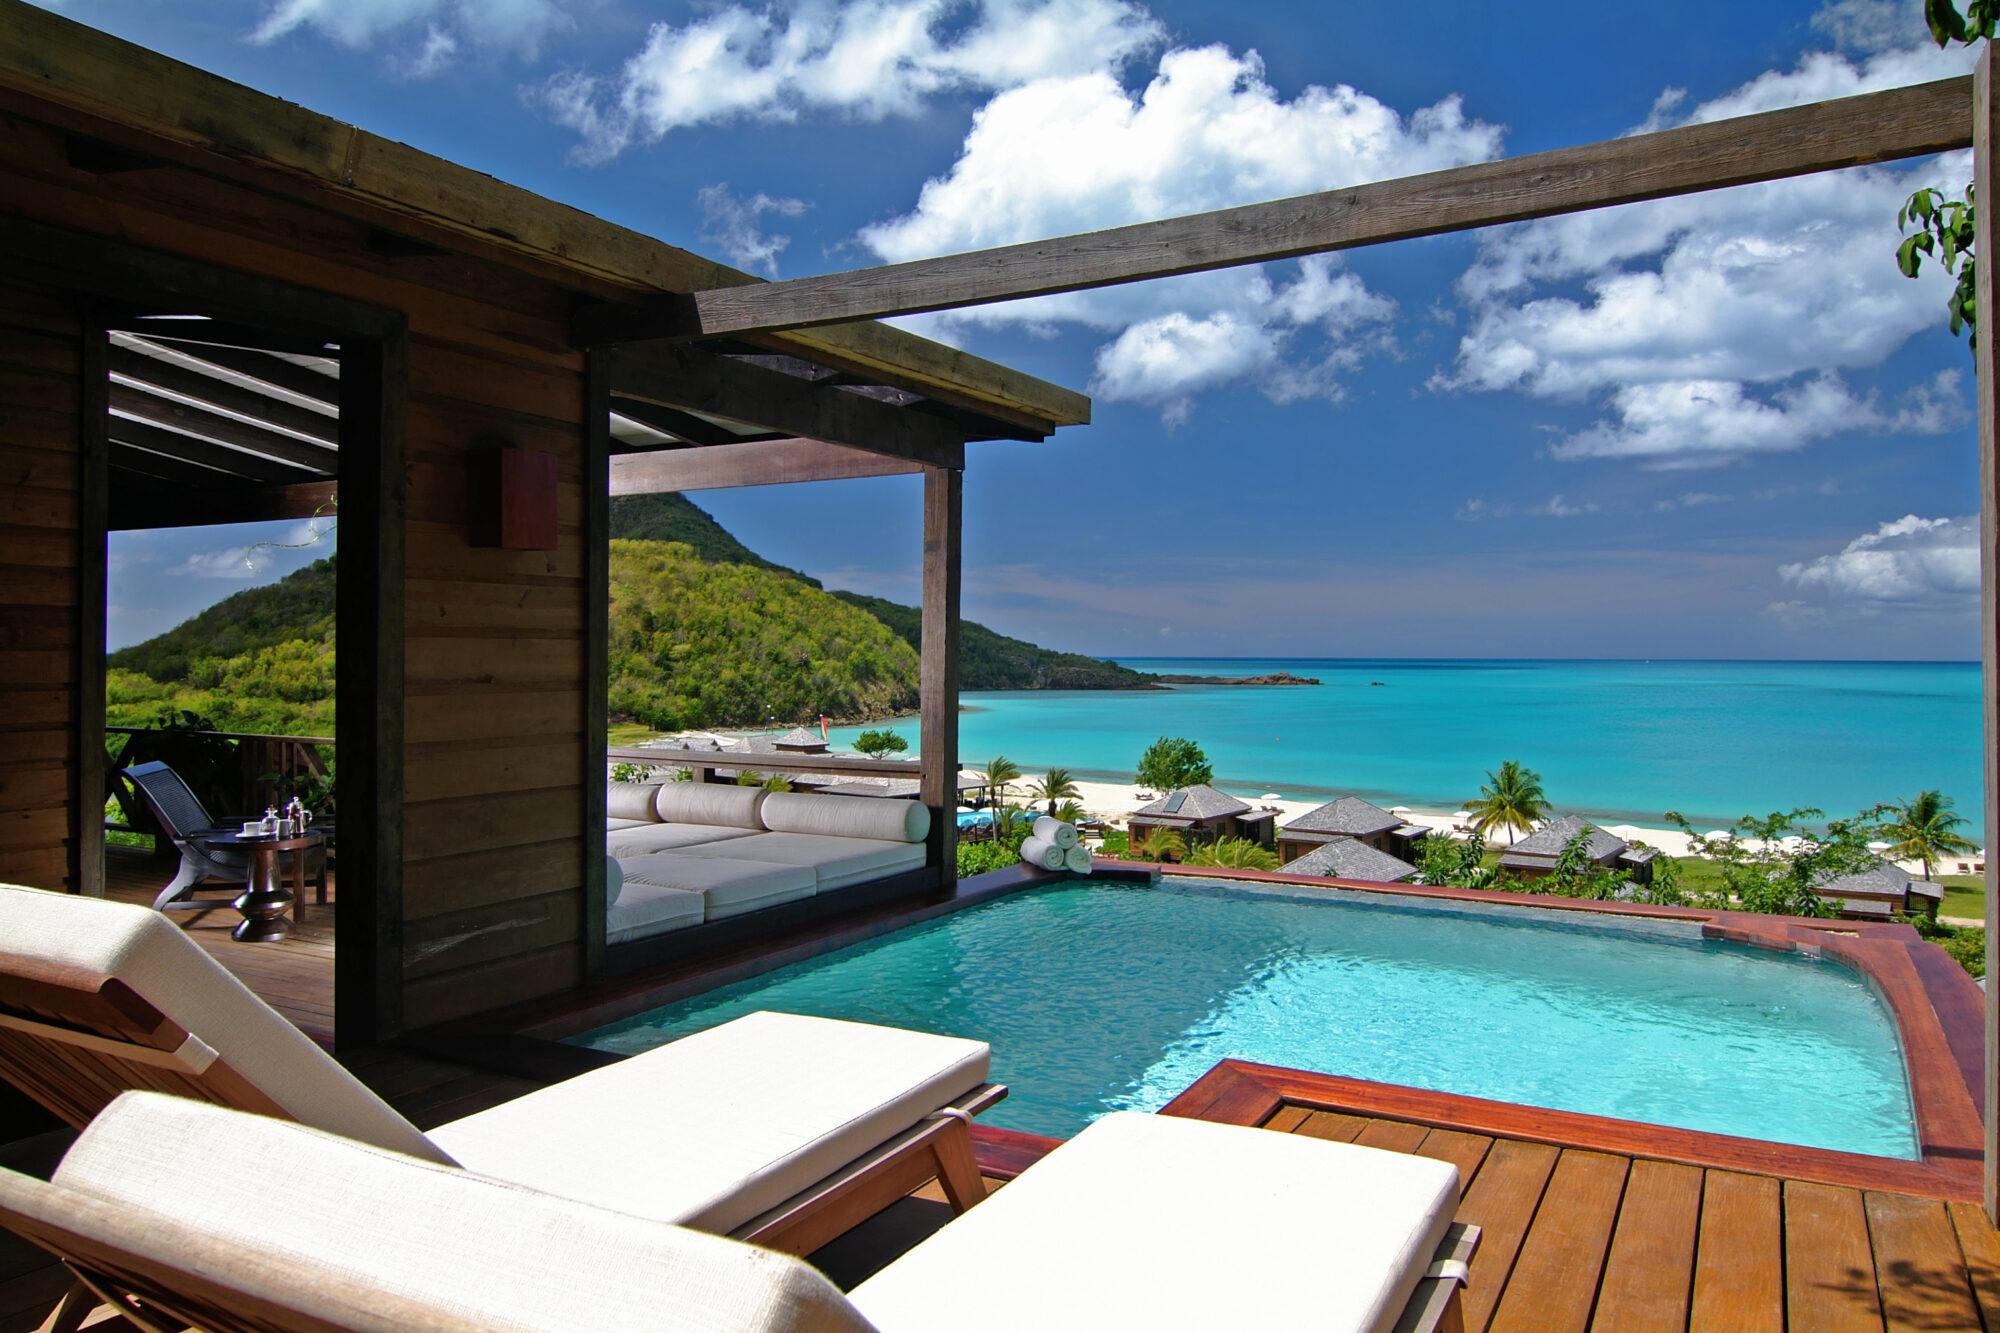 mhillside-cottage-plunge-pool-and-deck-hermitage-bay-hr